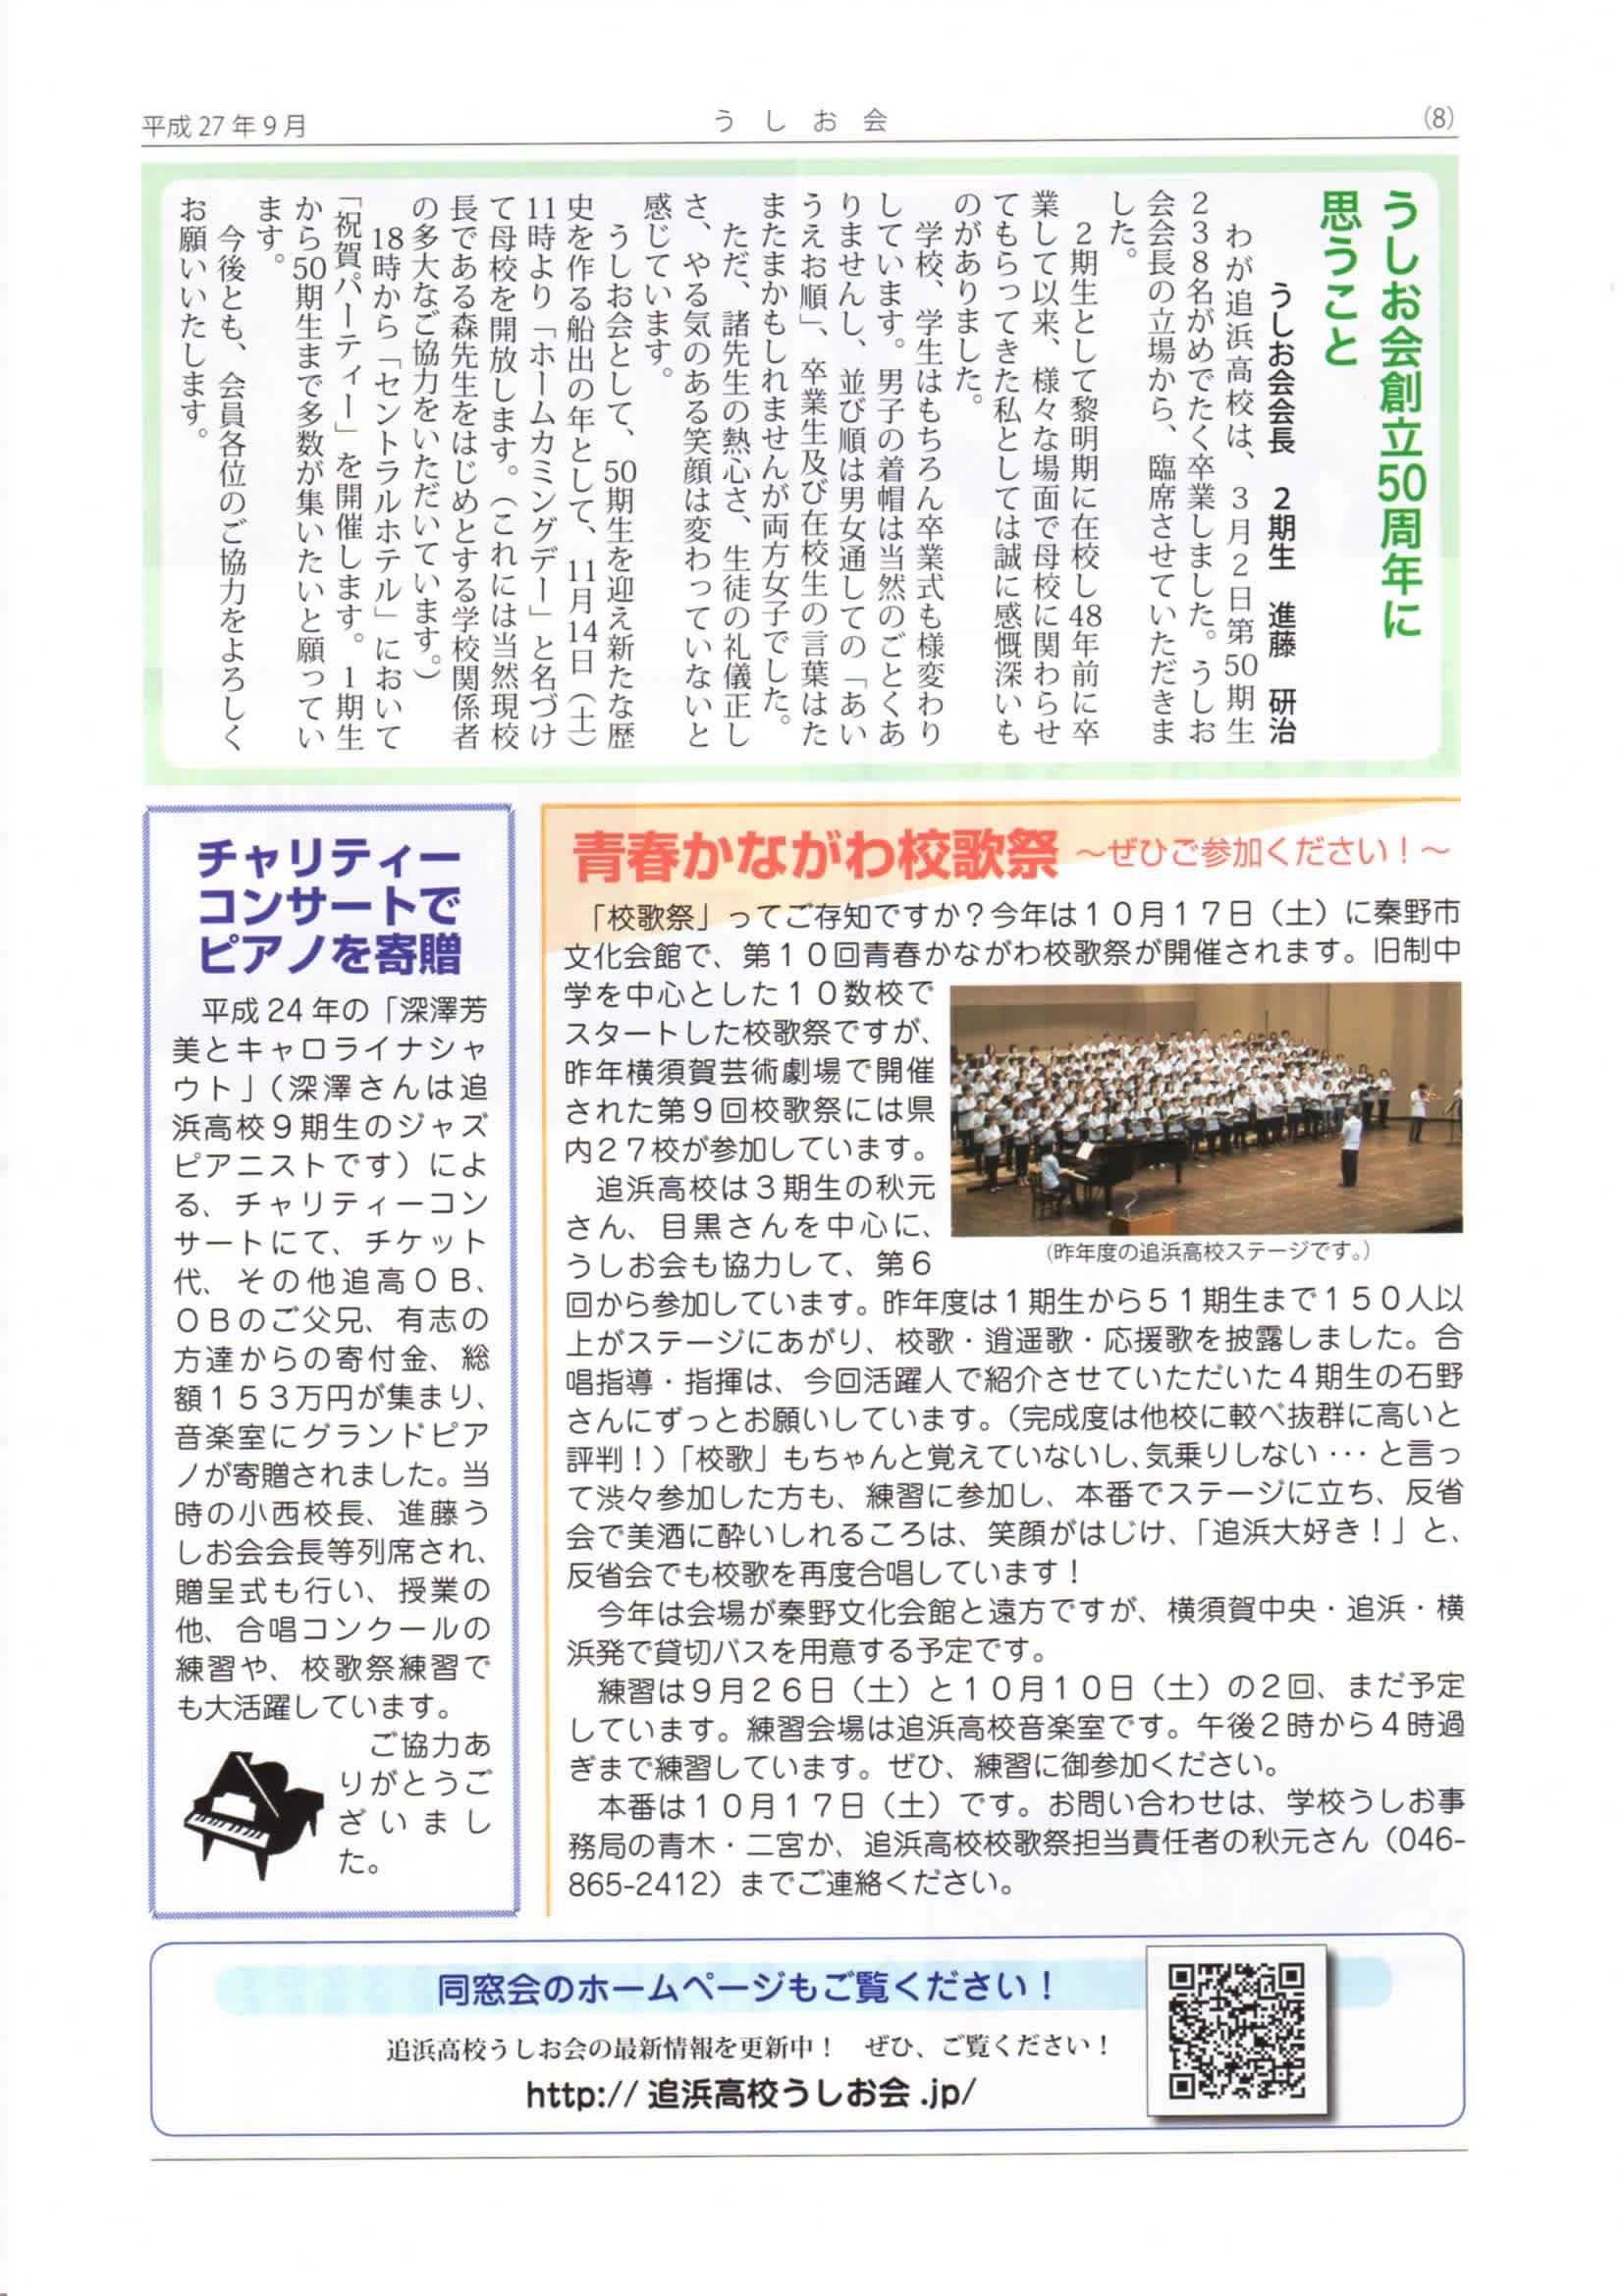 http://www.xn--p8ji2b326tgf0astg8i7difs.jp/ushio-info/images/ushio_201509_8.jpg